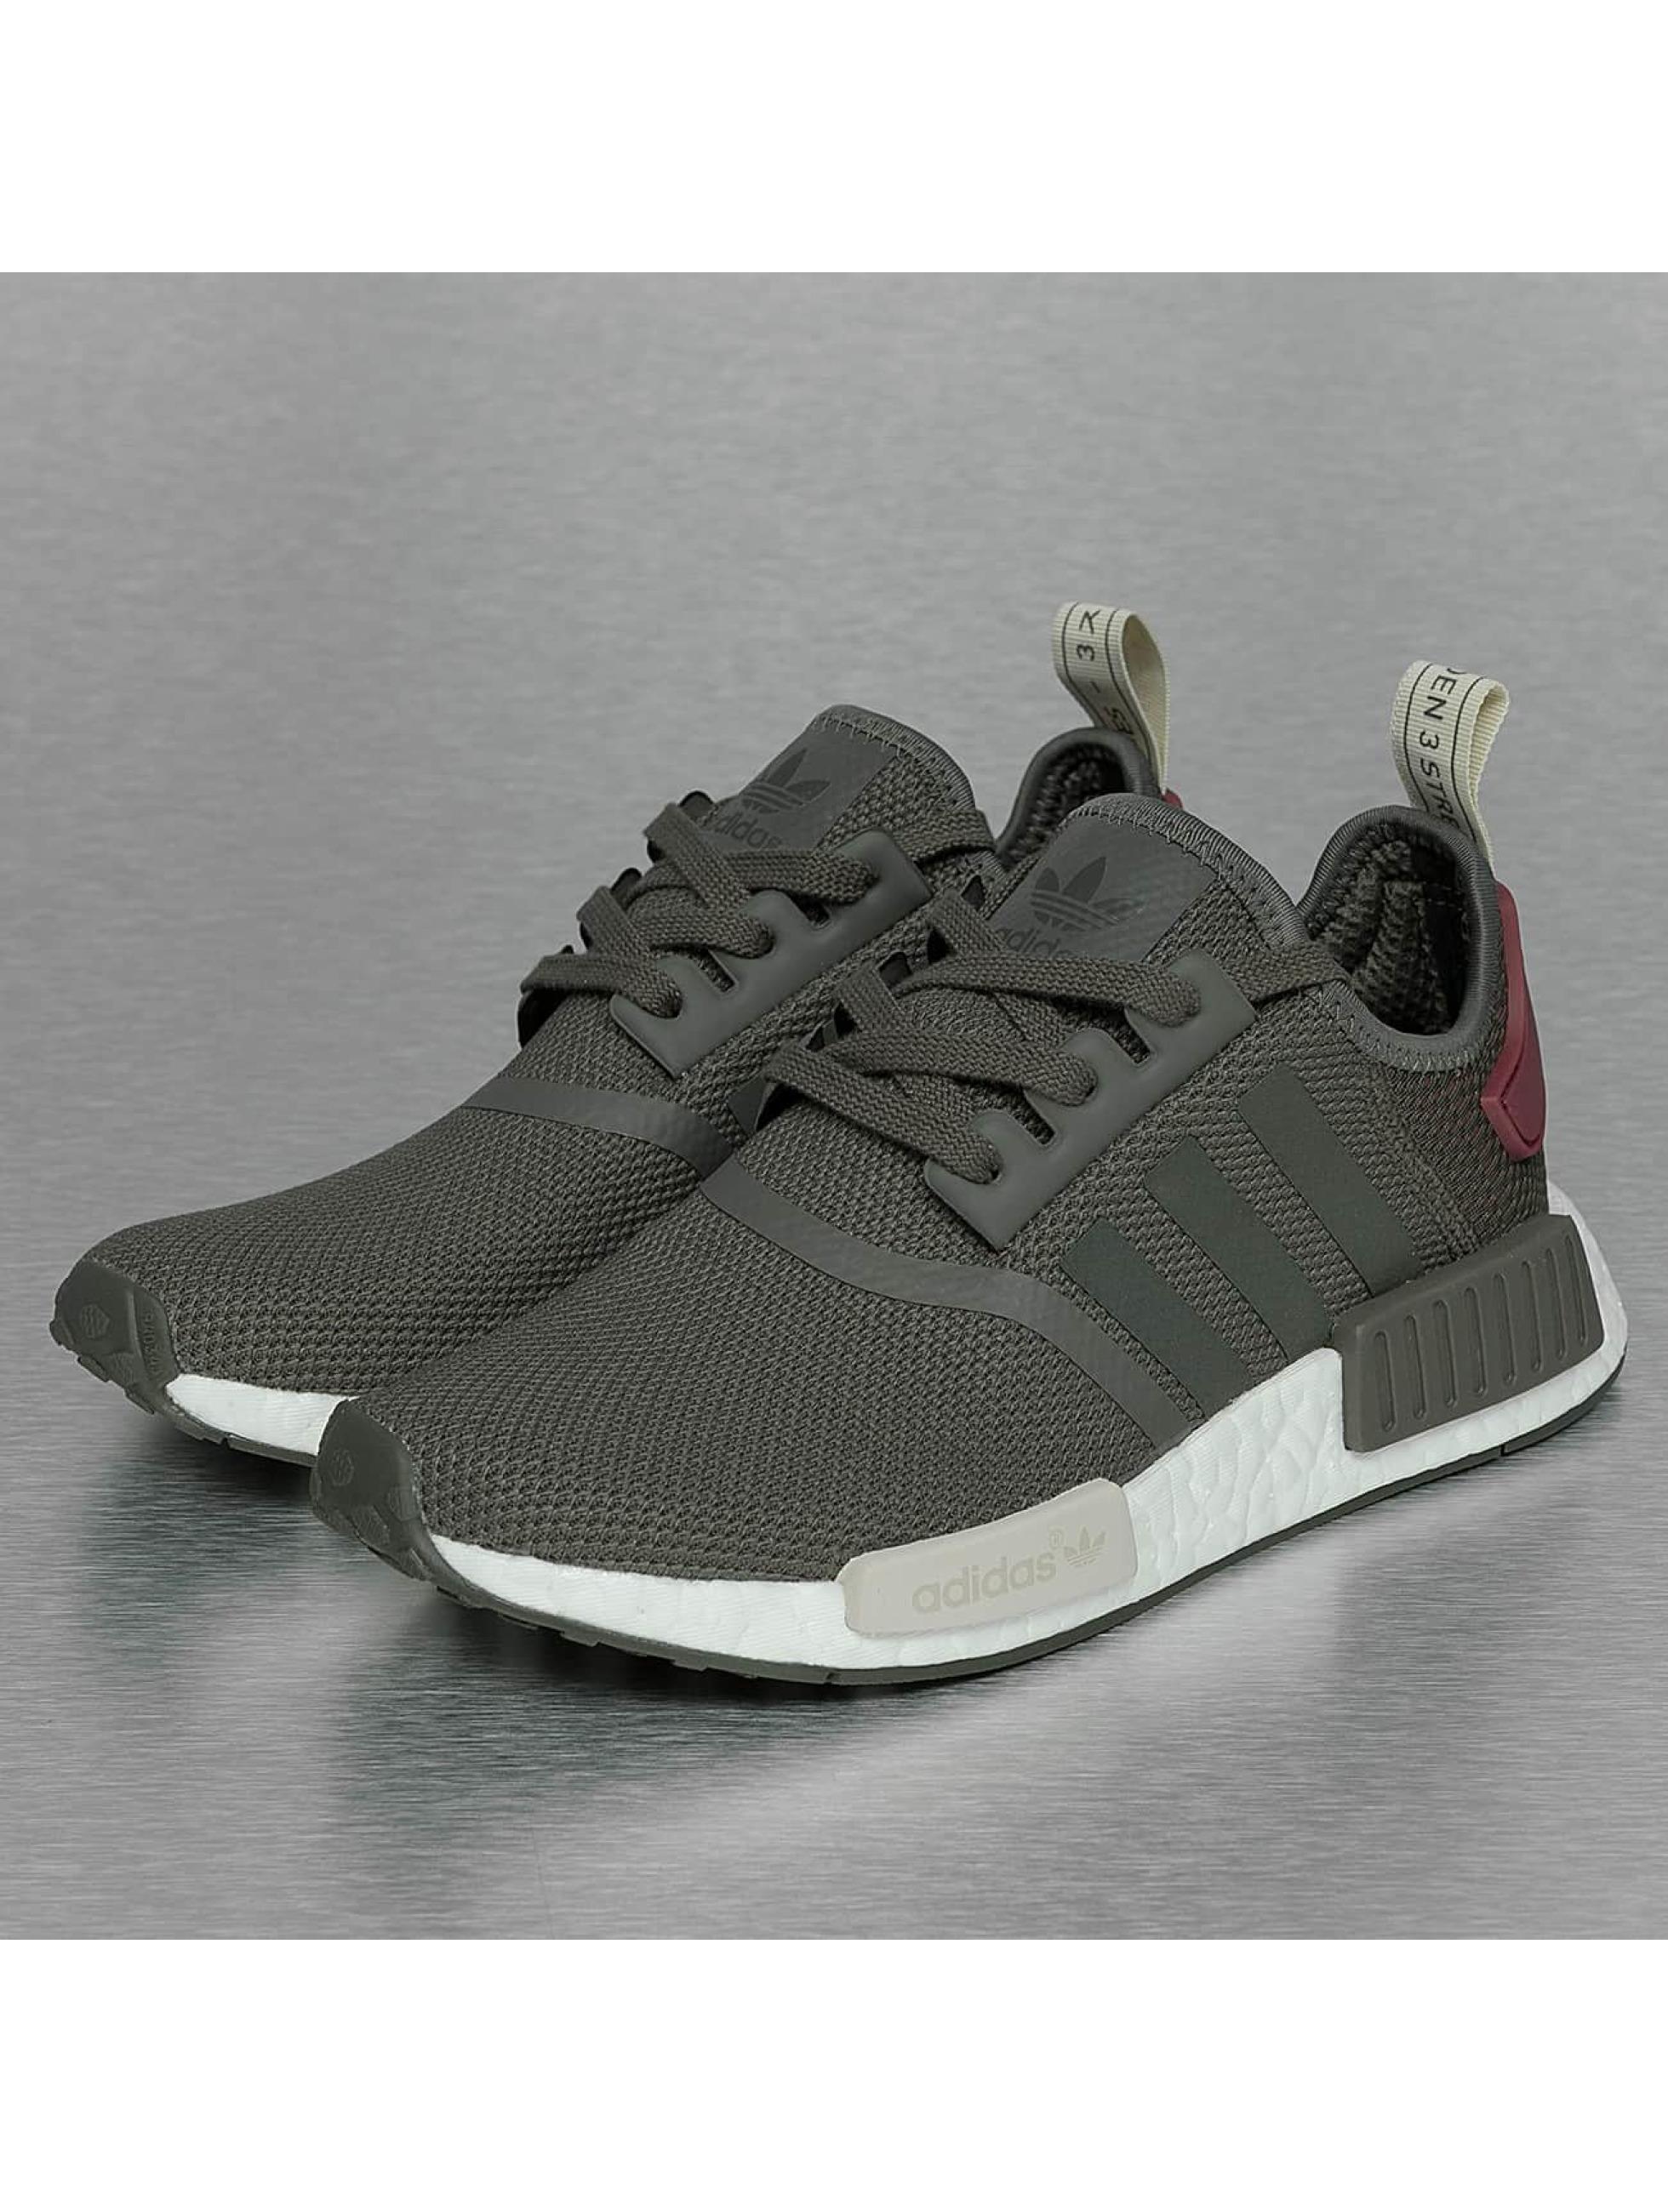 adidas herren schuhe sneaker nmd r1 w ebay. Black Bedroom Furniture Sets. Home Design Ideas